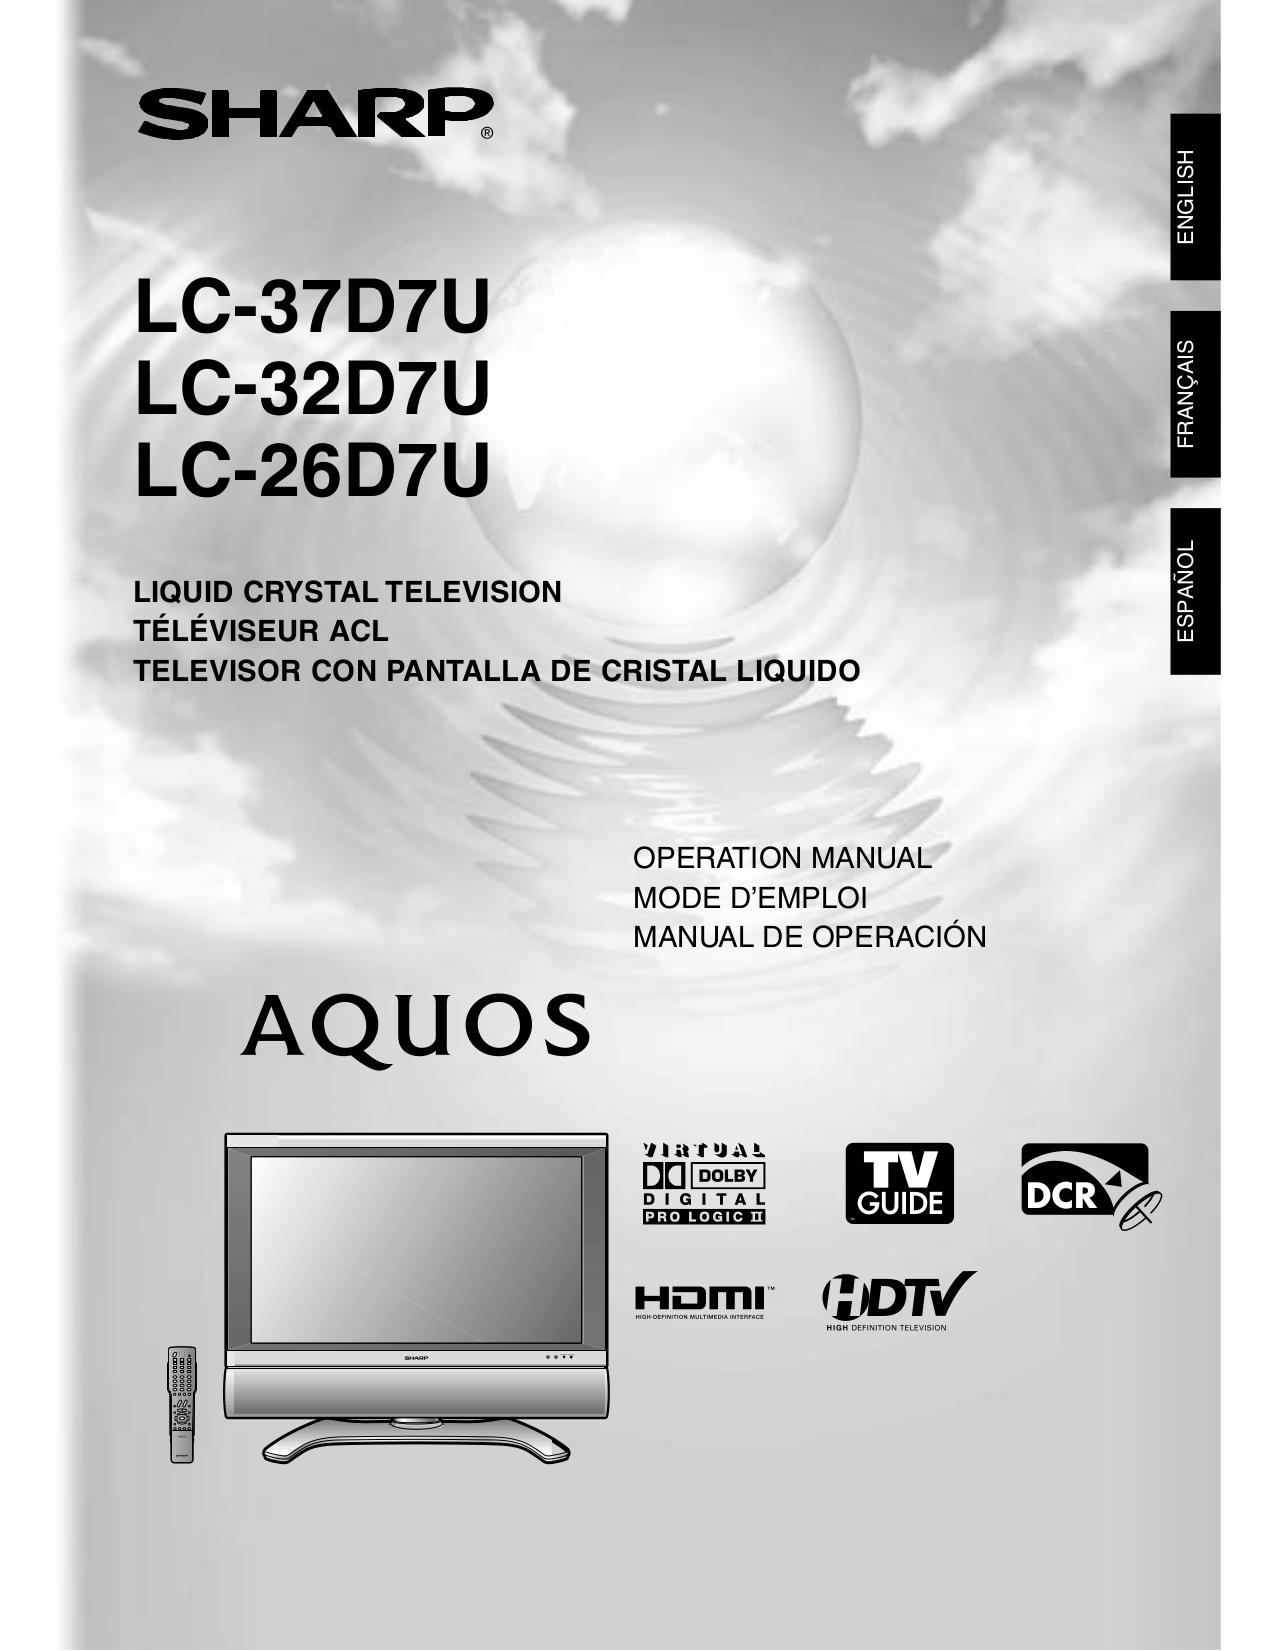 sharp aquos manual free owners manual u2022 rh wordworksbysea com sharp aquos lc-46d85un manual sharp aquos lc 46xd1e manual